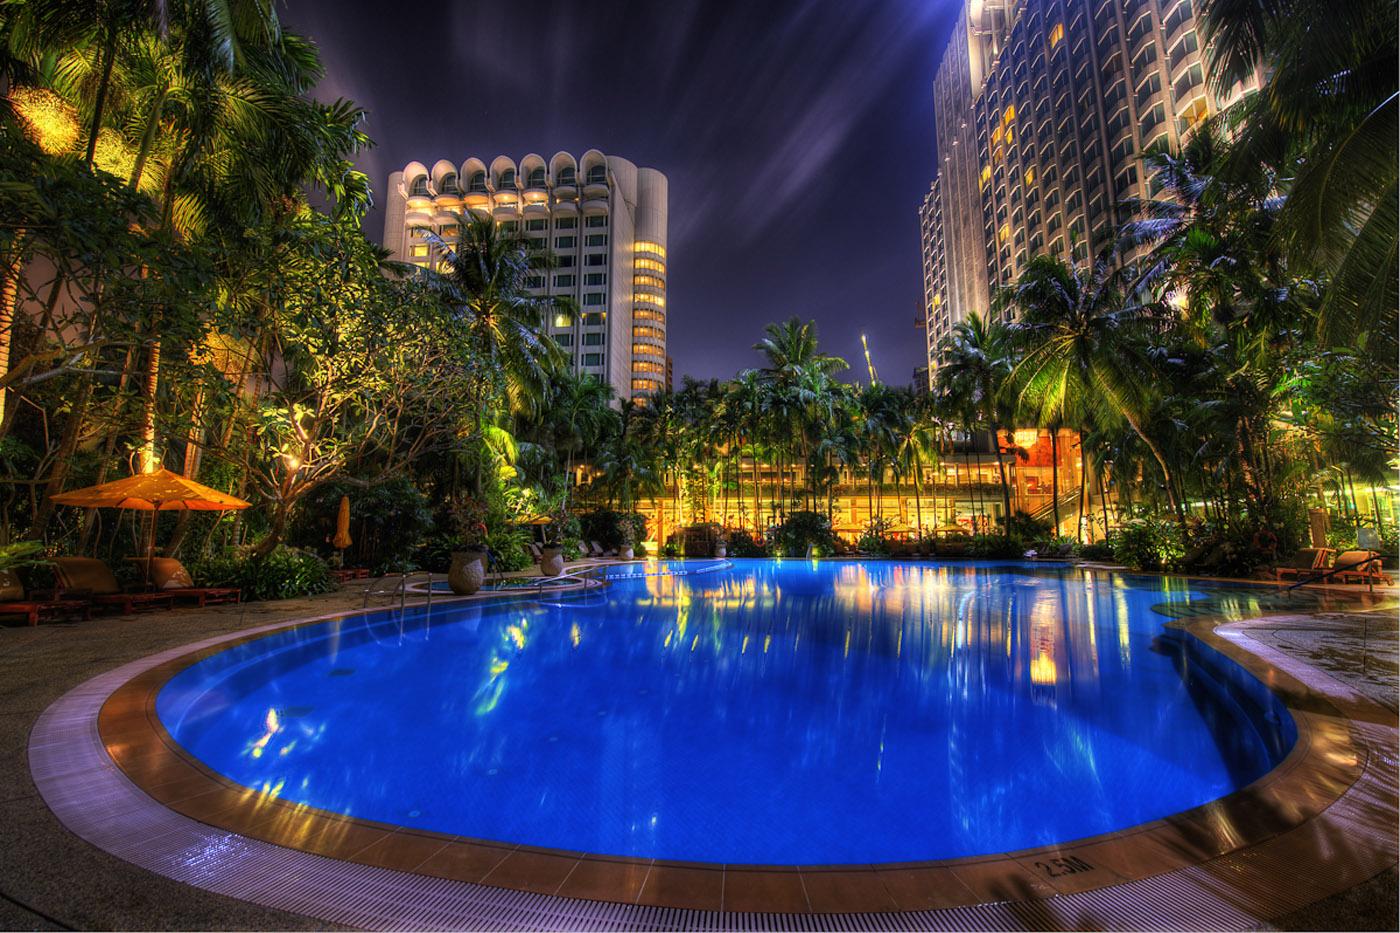 mihanbana hotel 9